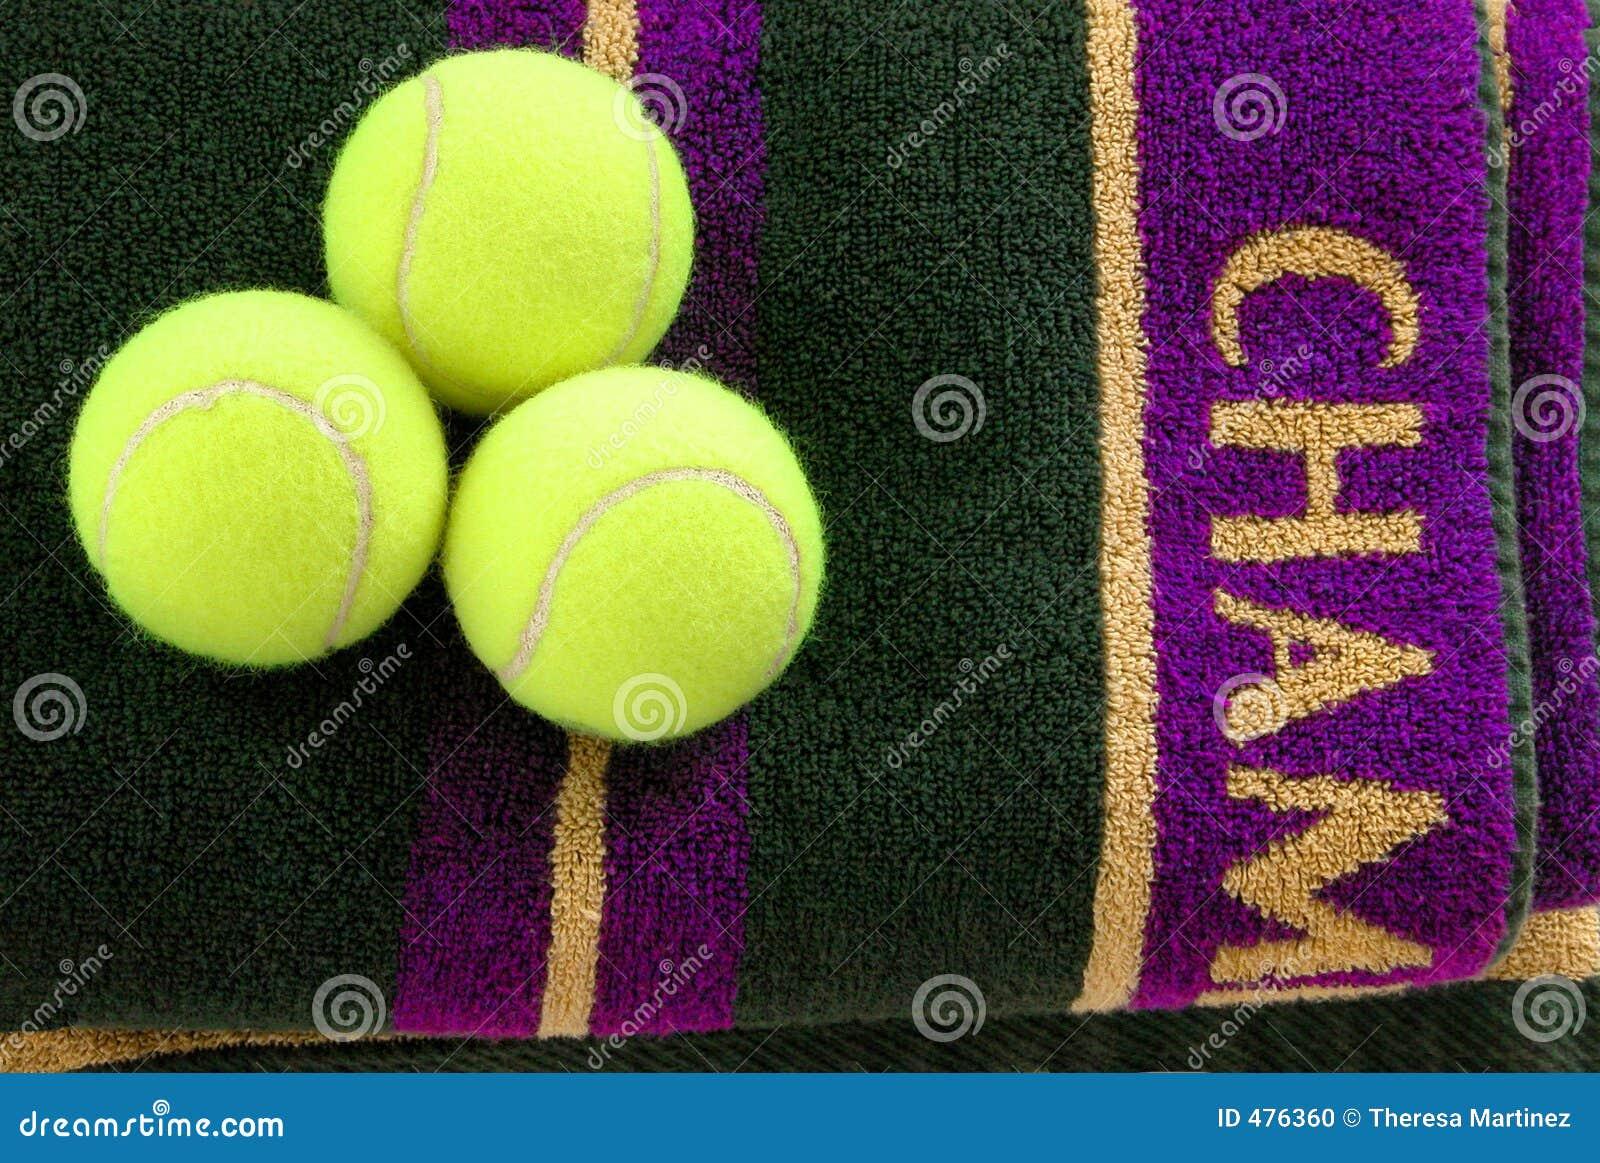 Championship Towel